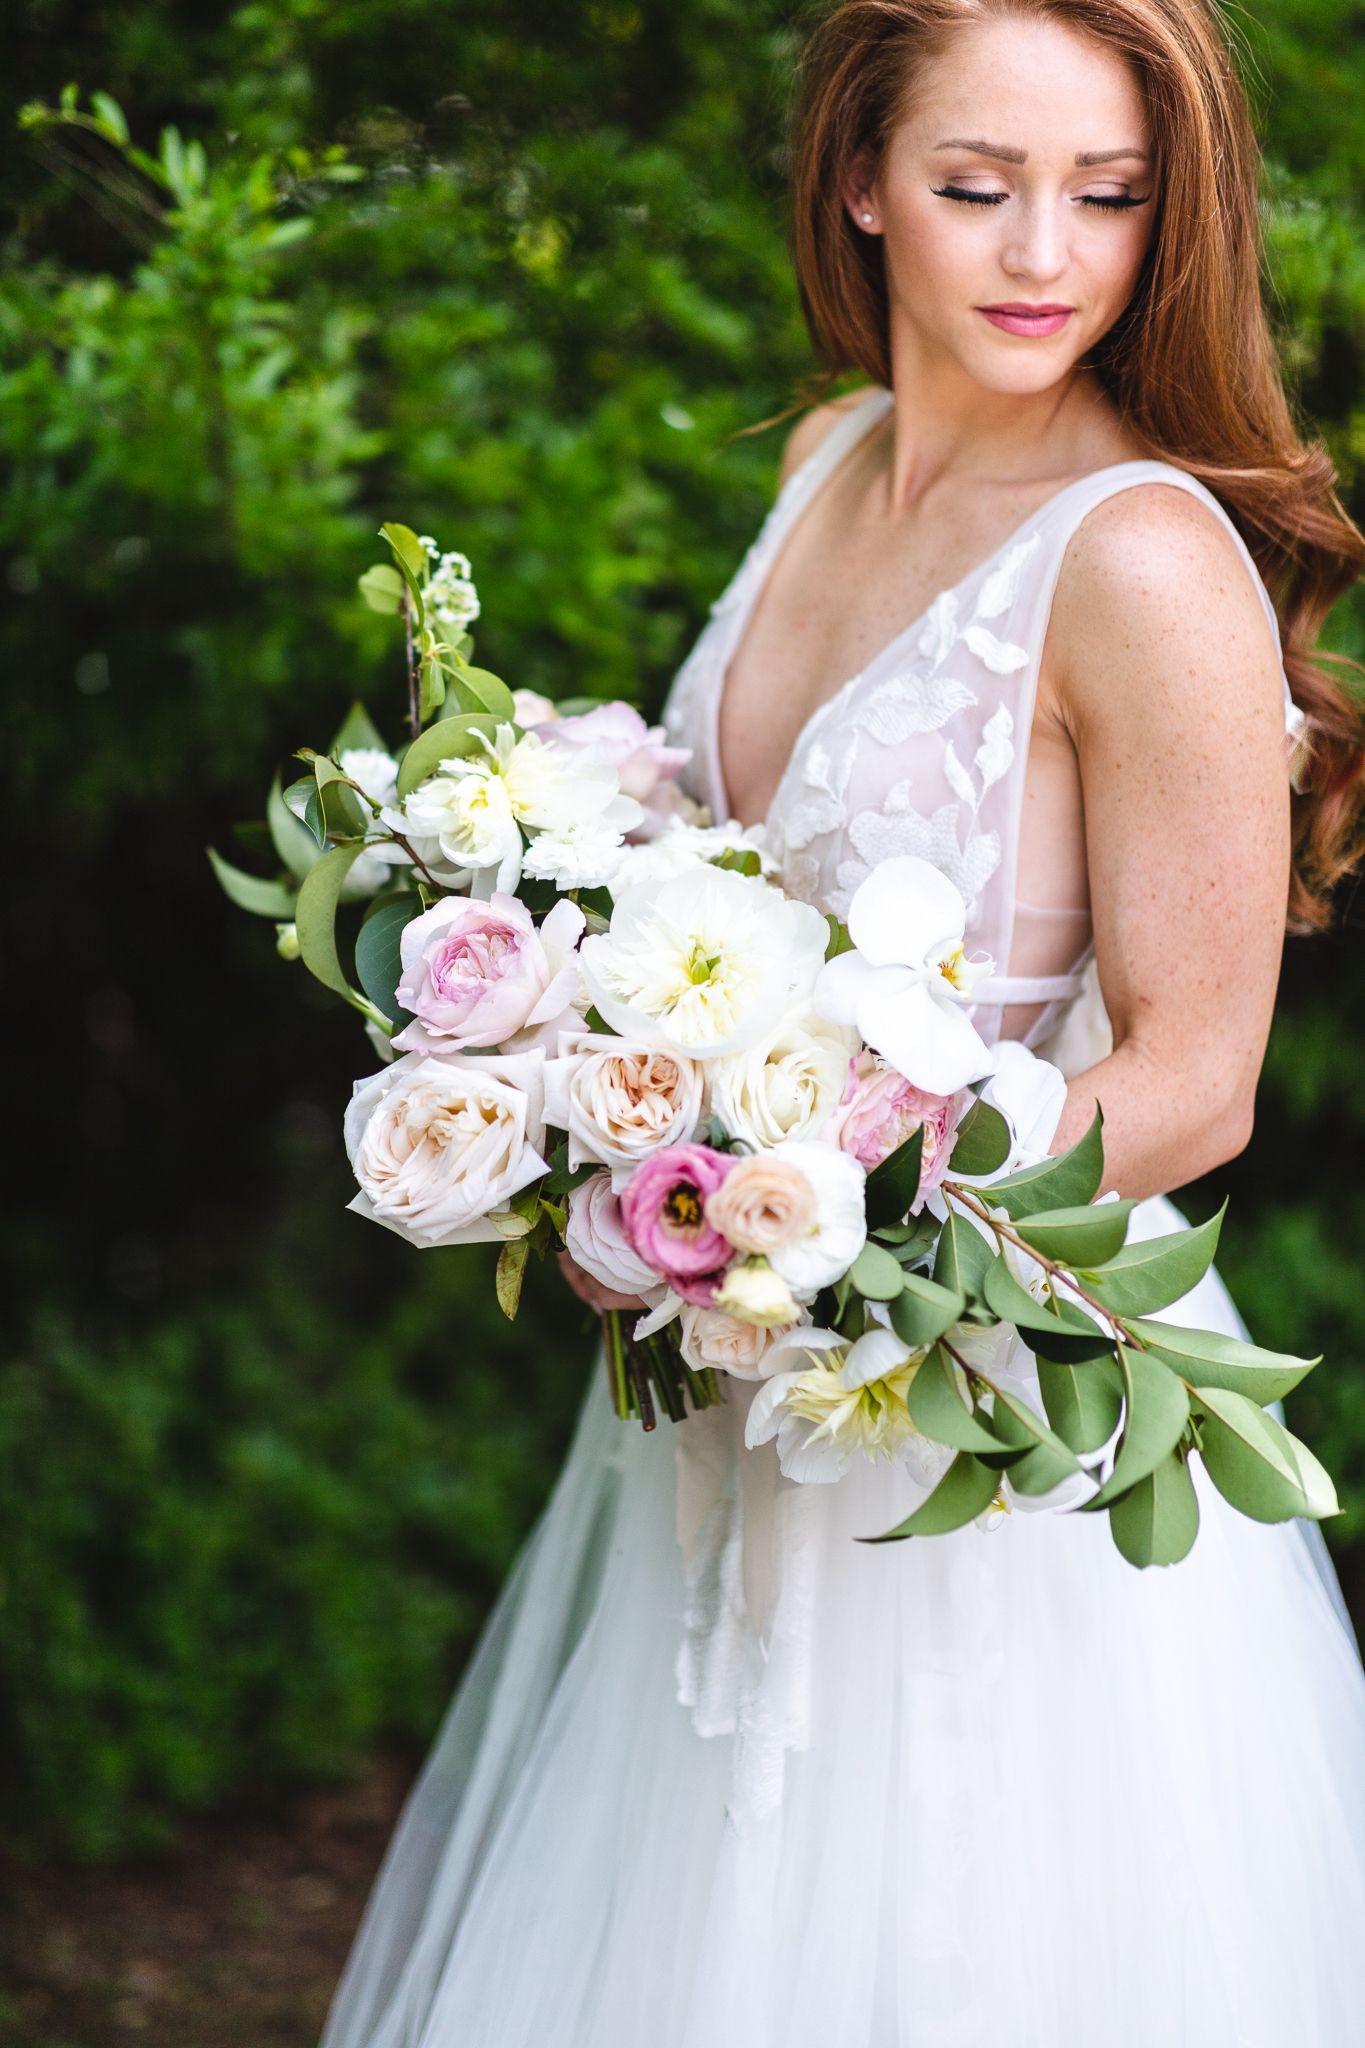 Lizzie bee flower shoppe bridal bouquet Dallas Texas